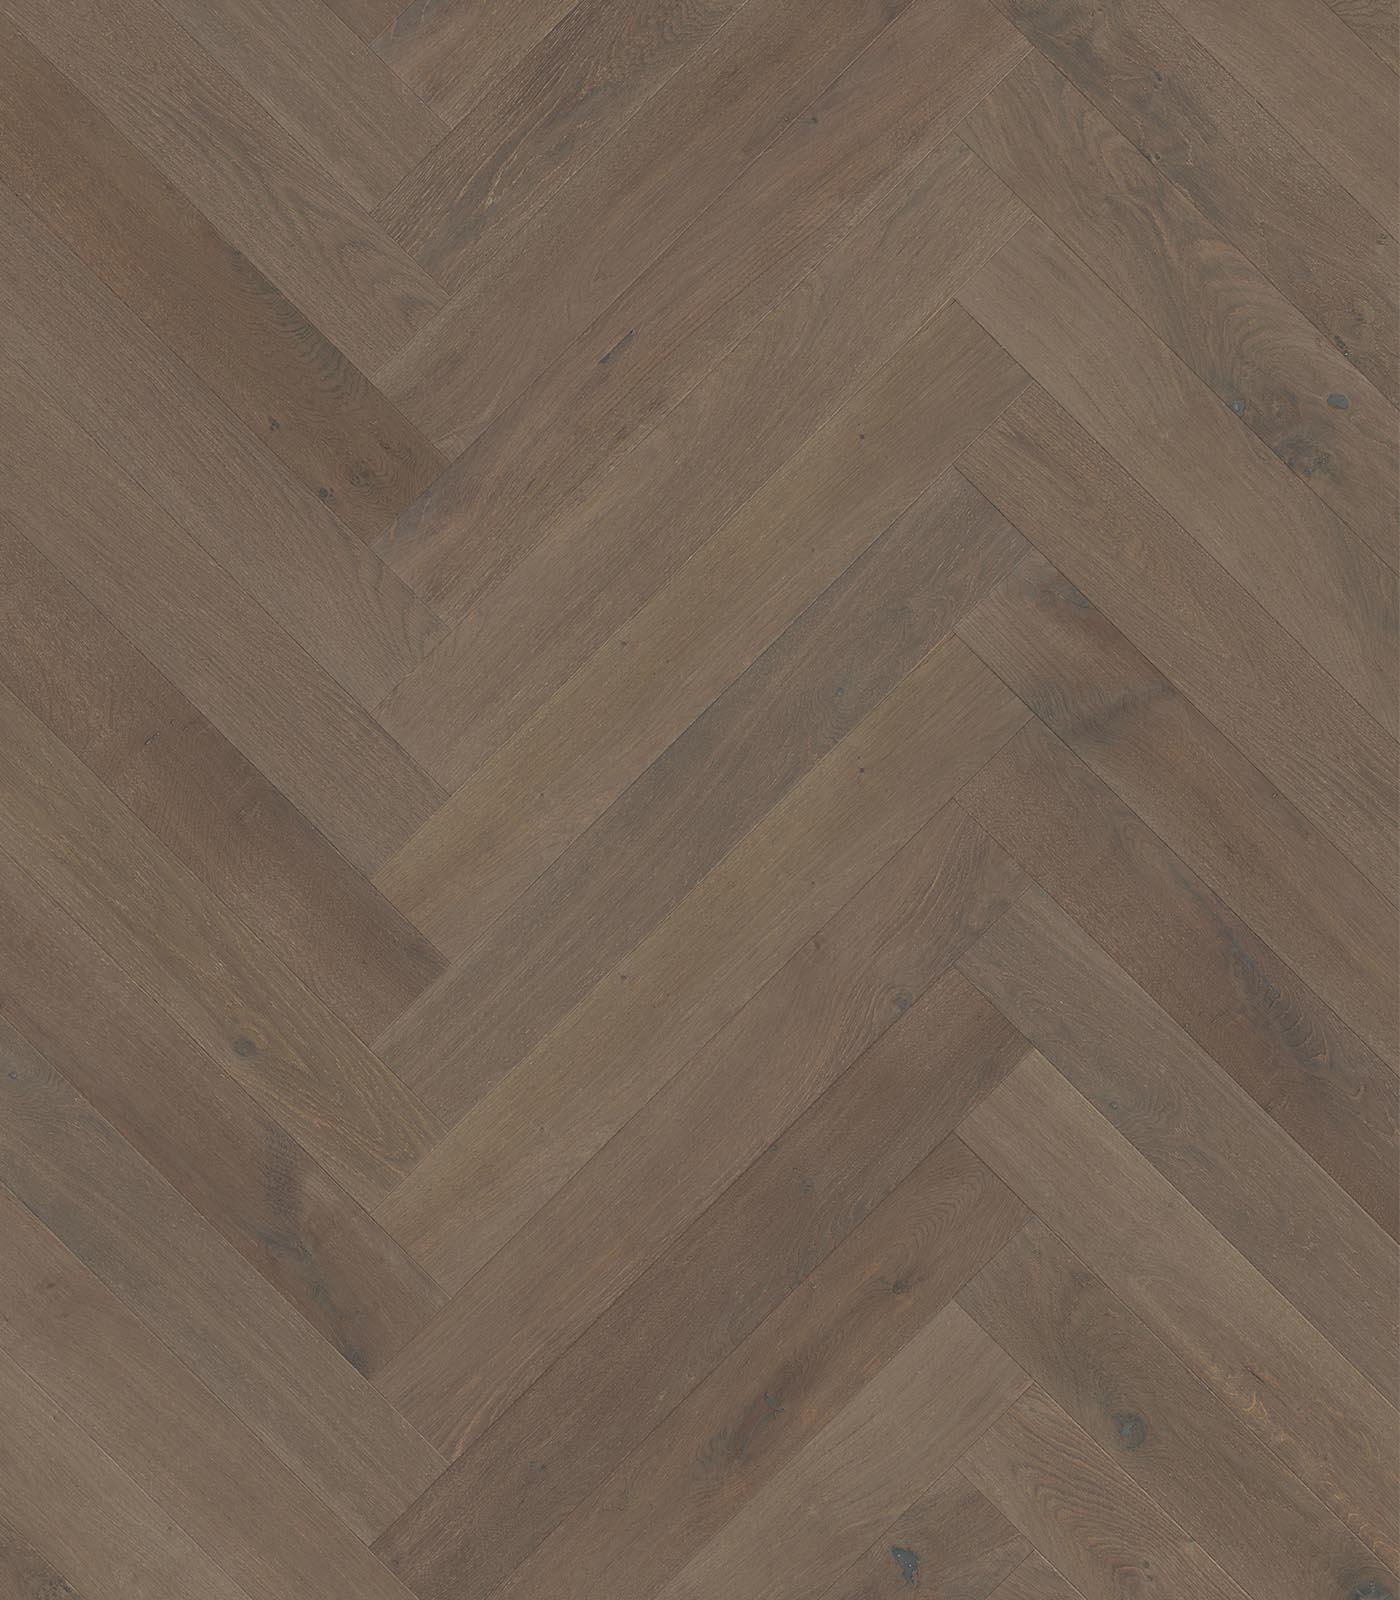 European Herringbone Oak Floors-Brittany-Fashion Collection-flat